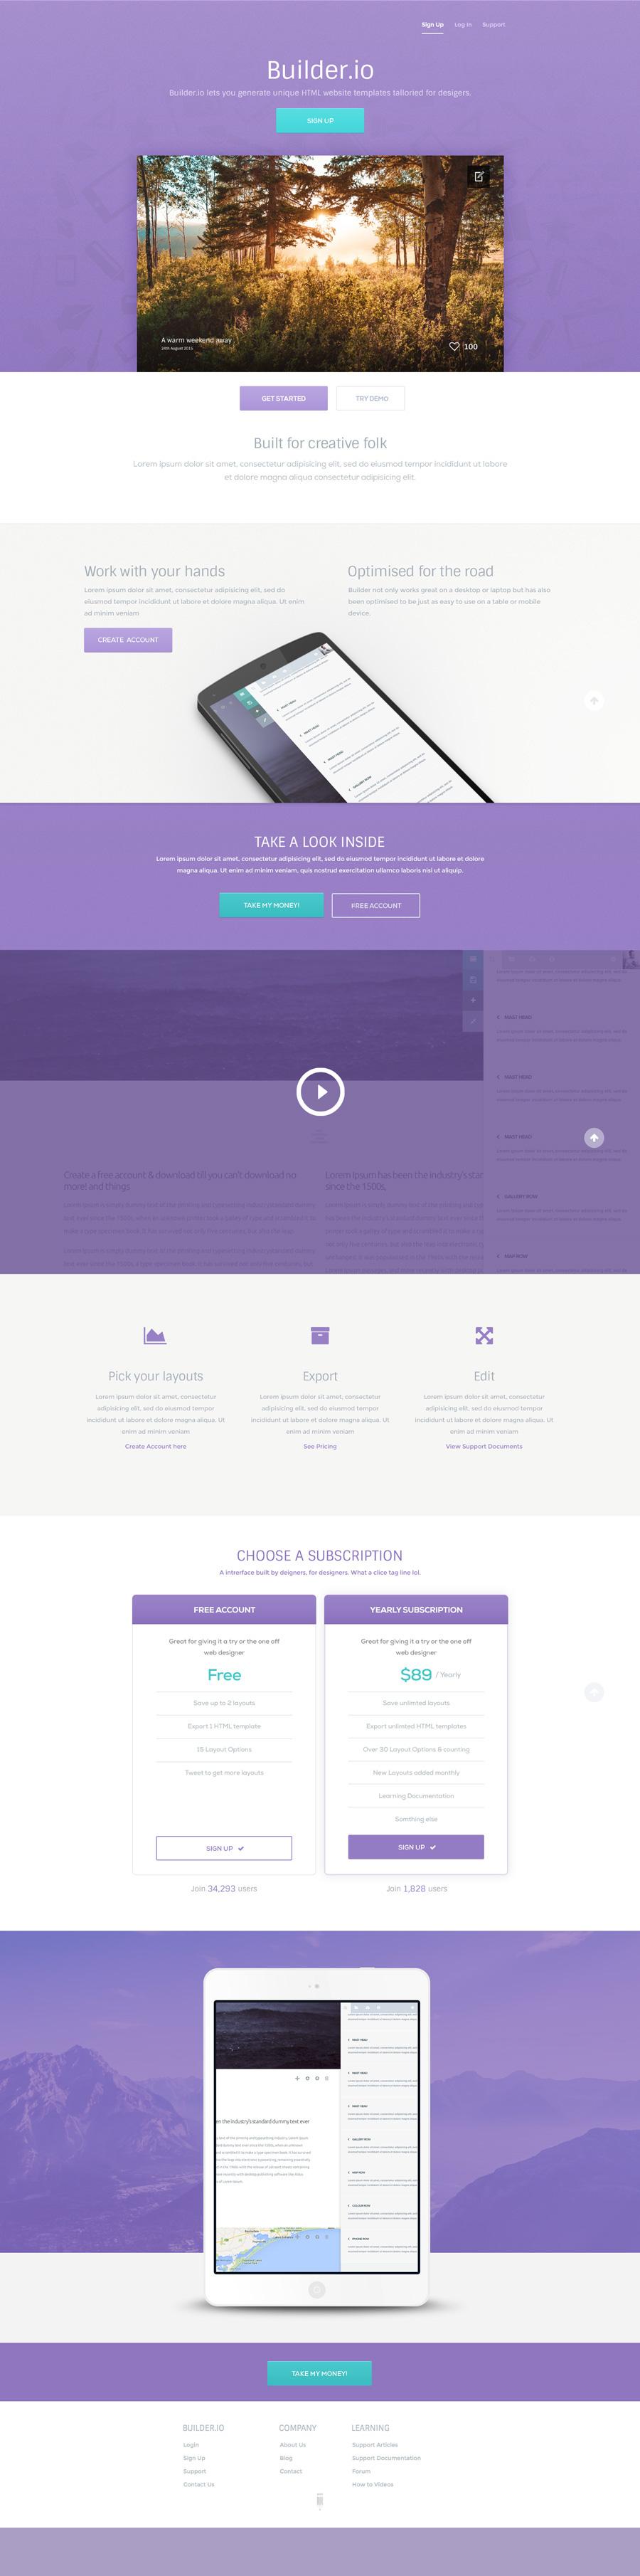 web template builder